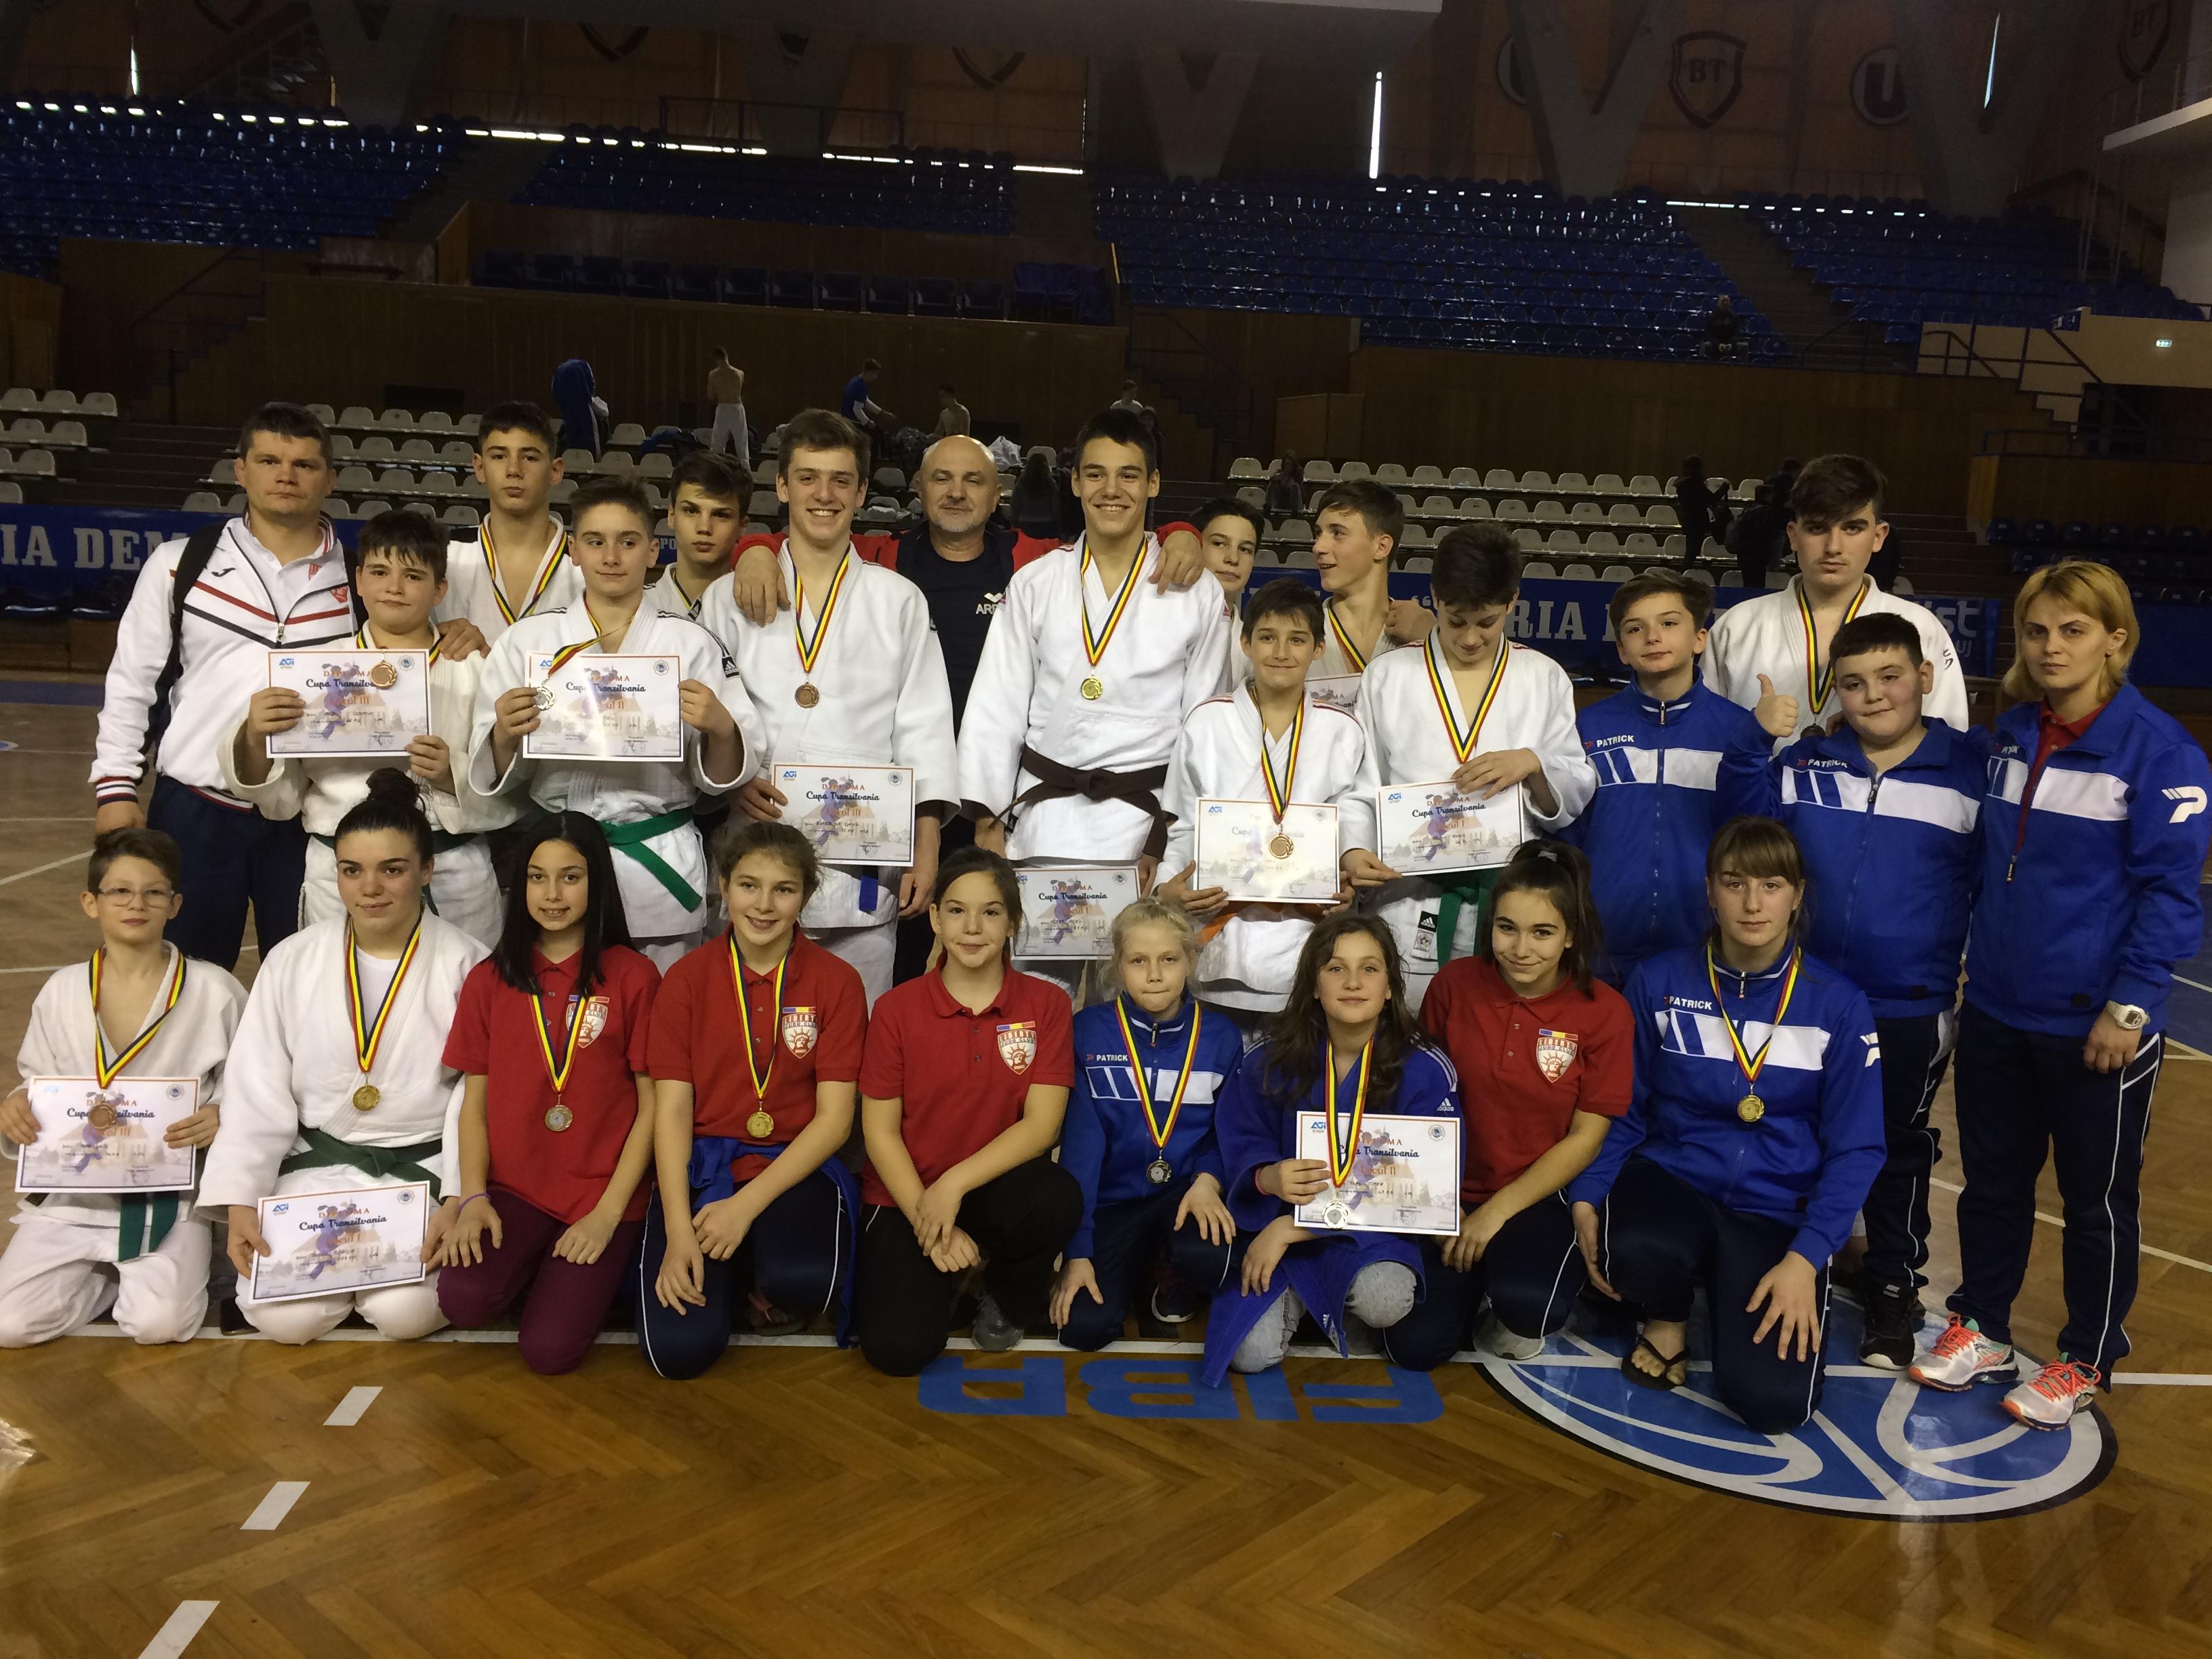 19 de medalii cucerite de judoka de la LPS-CSS Liberty Oradea la Cupa Transivaniei de la Cluj Napoca